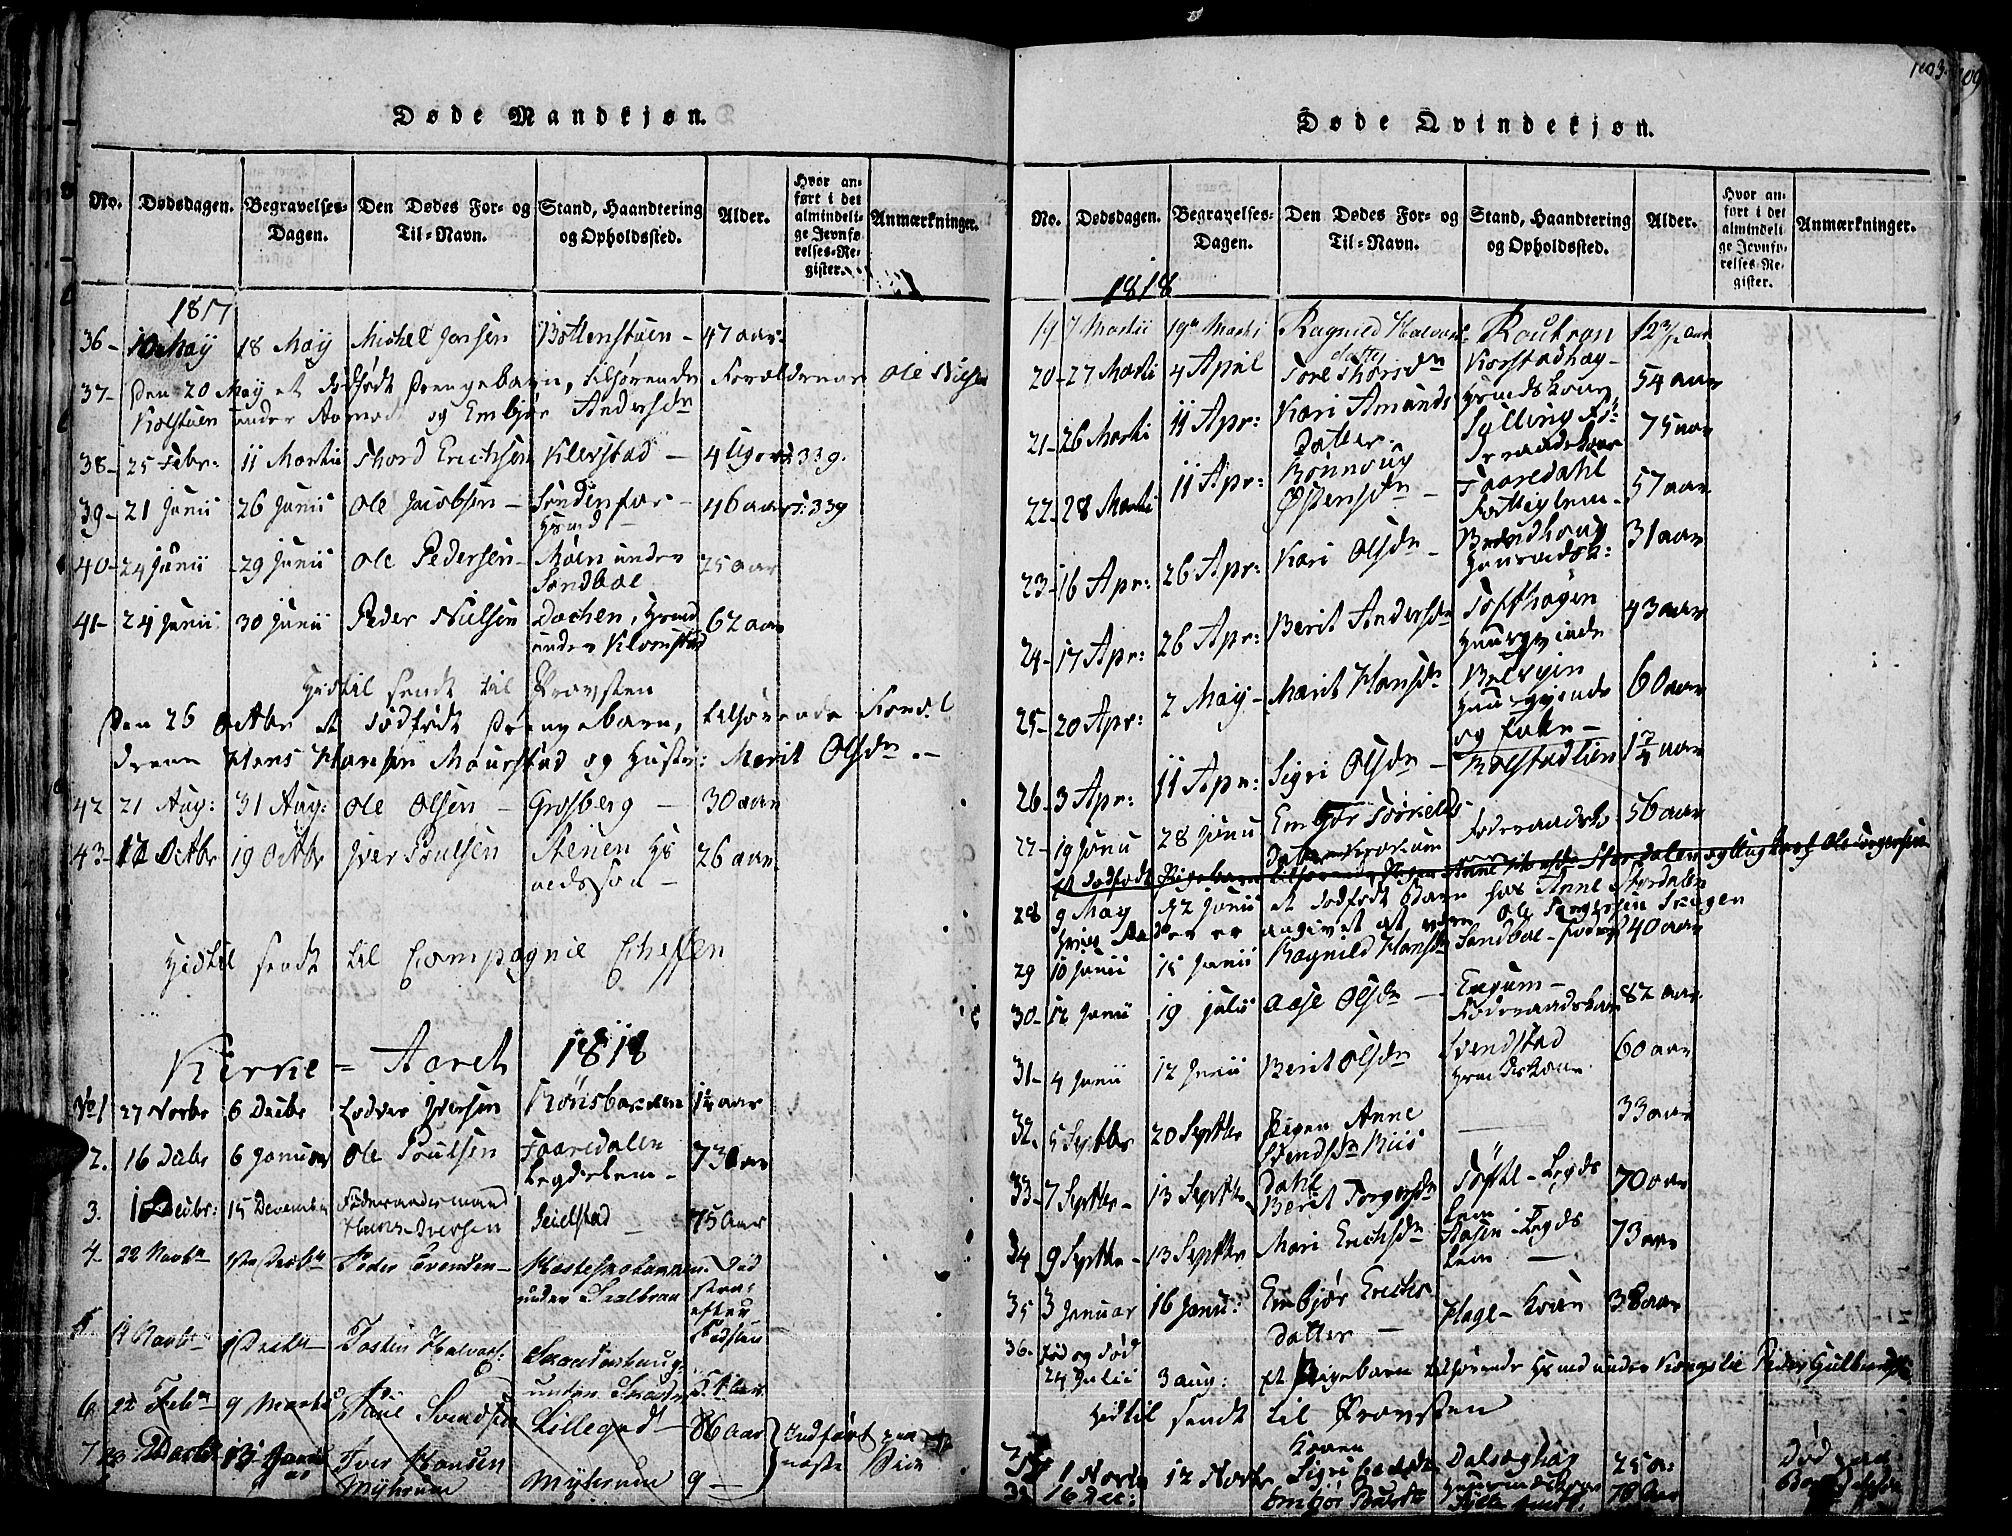 SAH, Fron prestekontor, H/Ha/Haa/L0002: Ministerialbok nr. 2, 1816-1827, s. 102